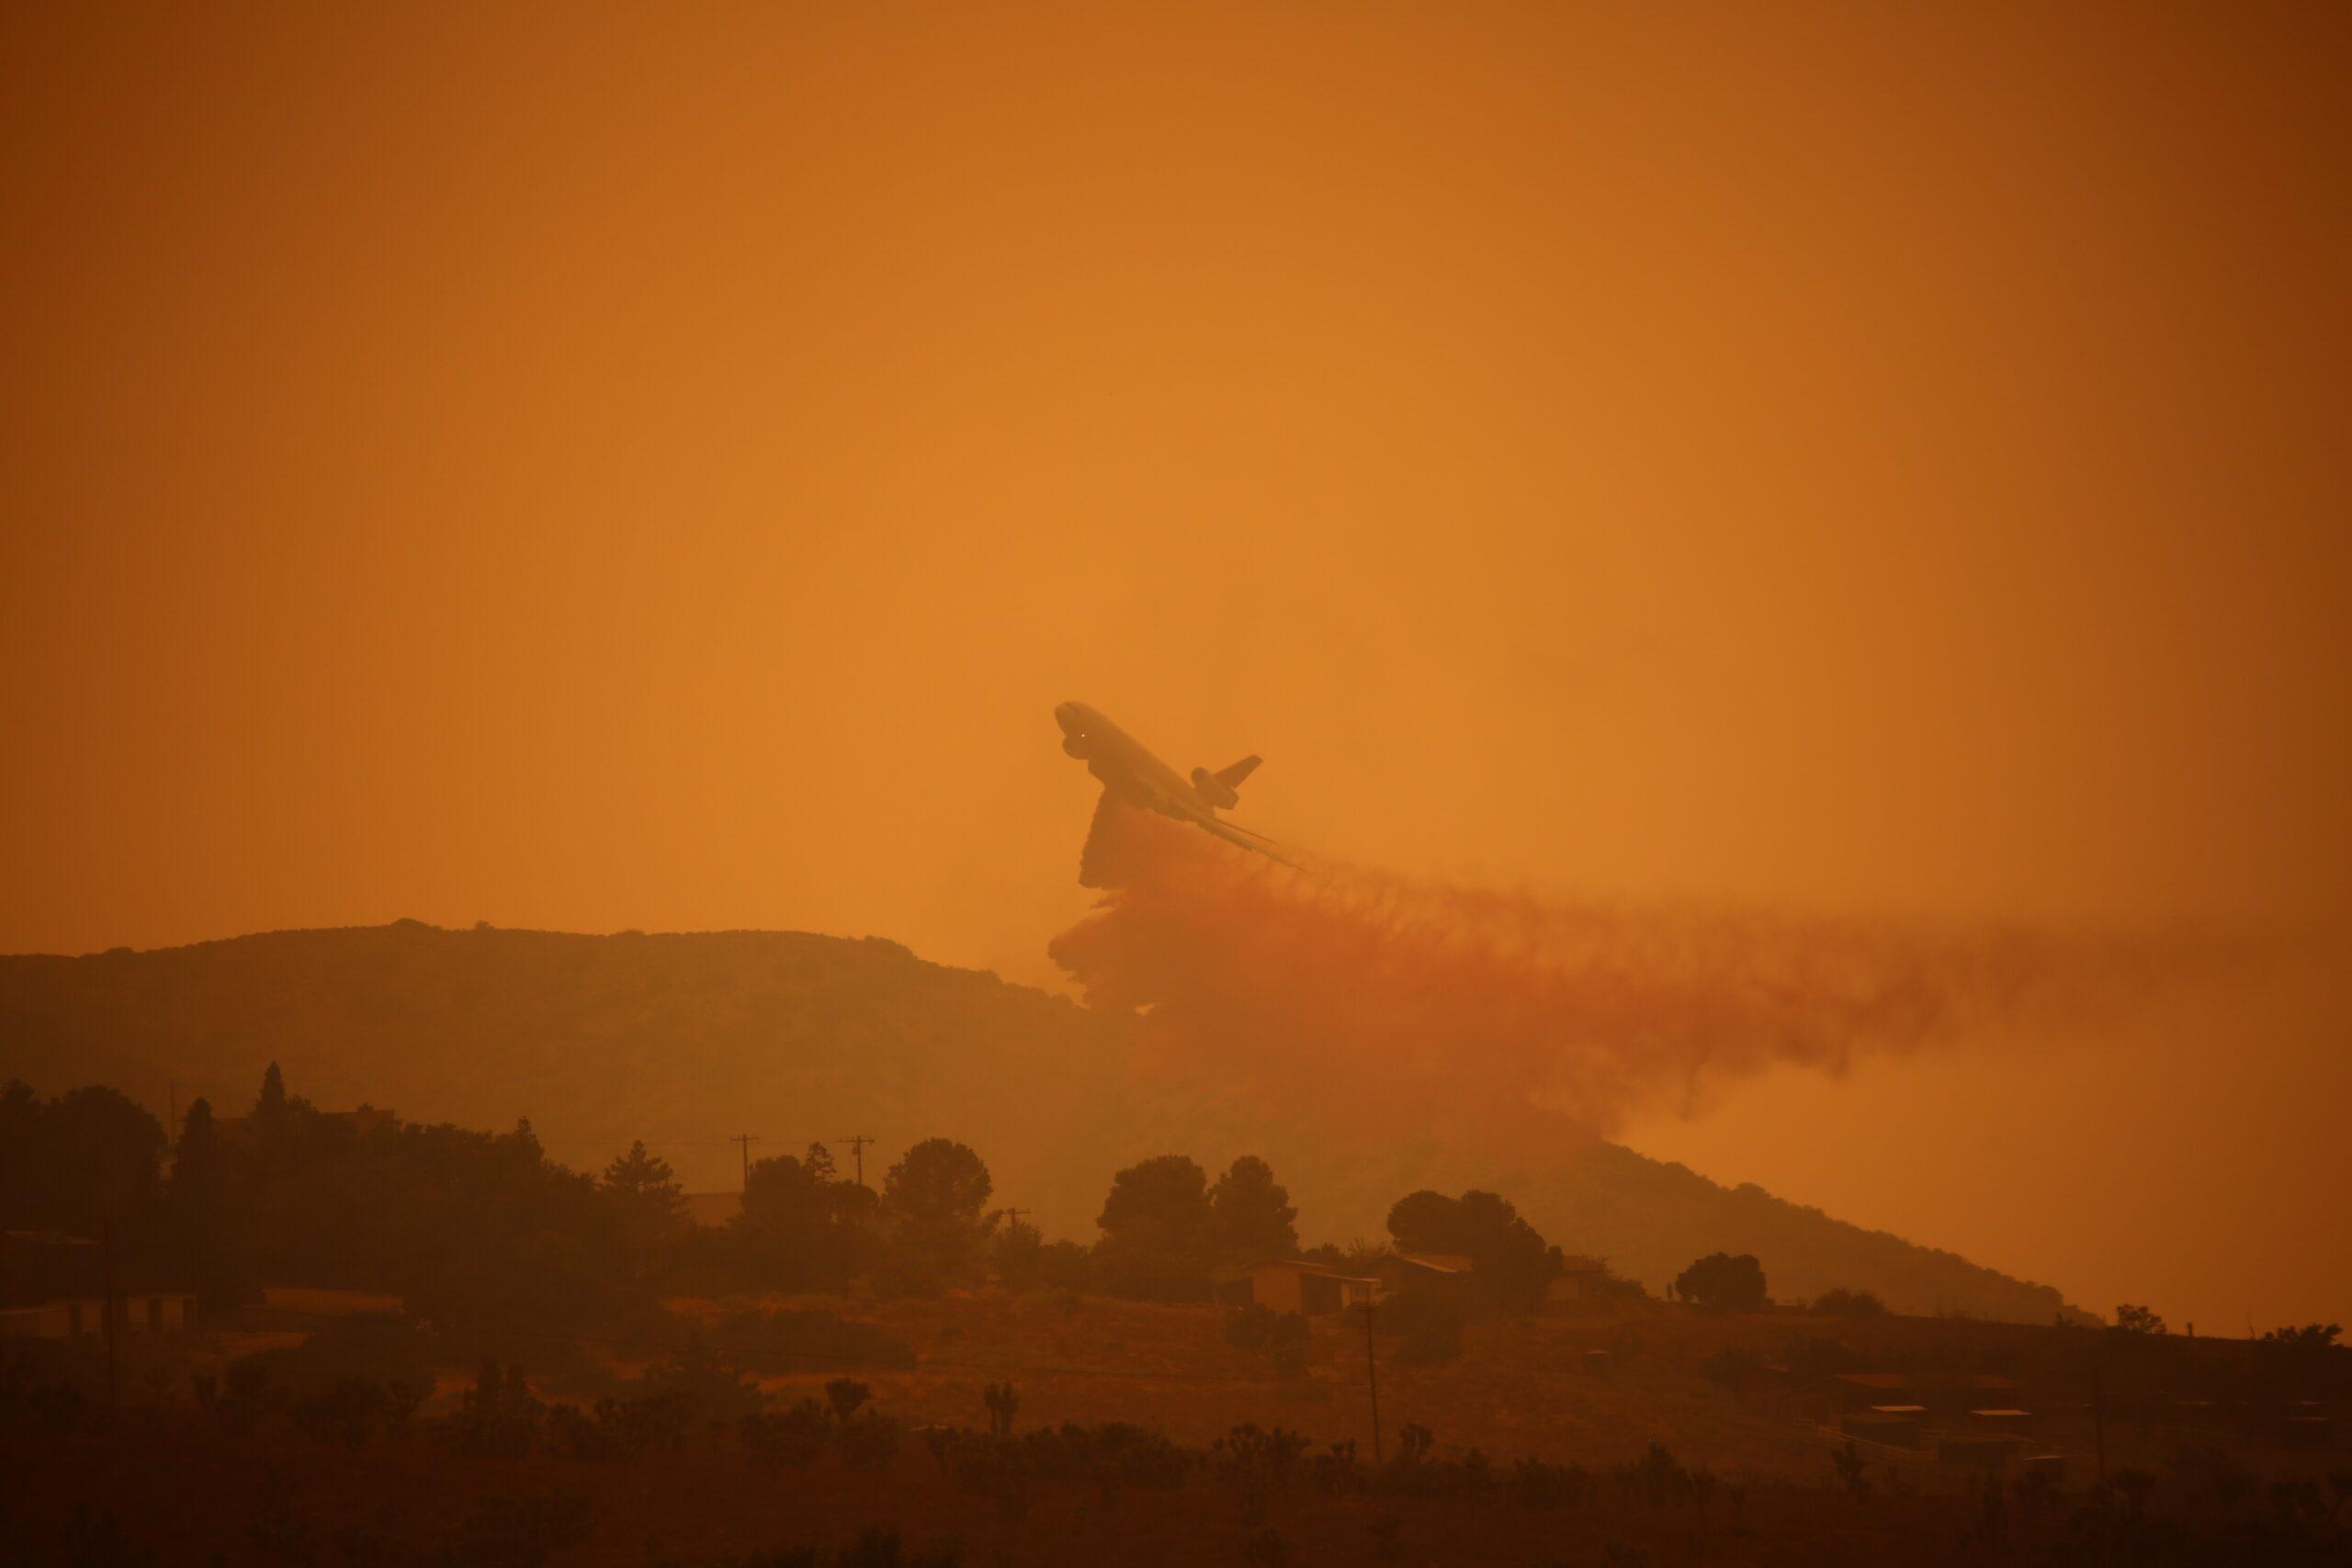 90180 Firefighter Killed As Blazes Spread Near L.A., Threatening Suburban Communities, Palm Springs